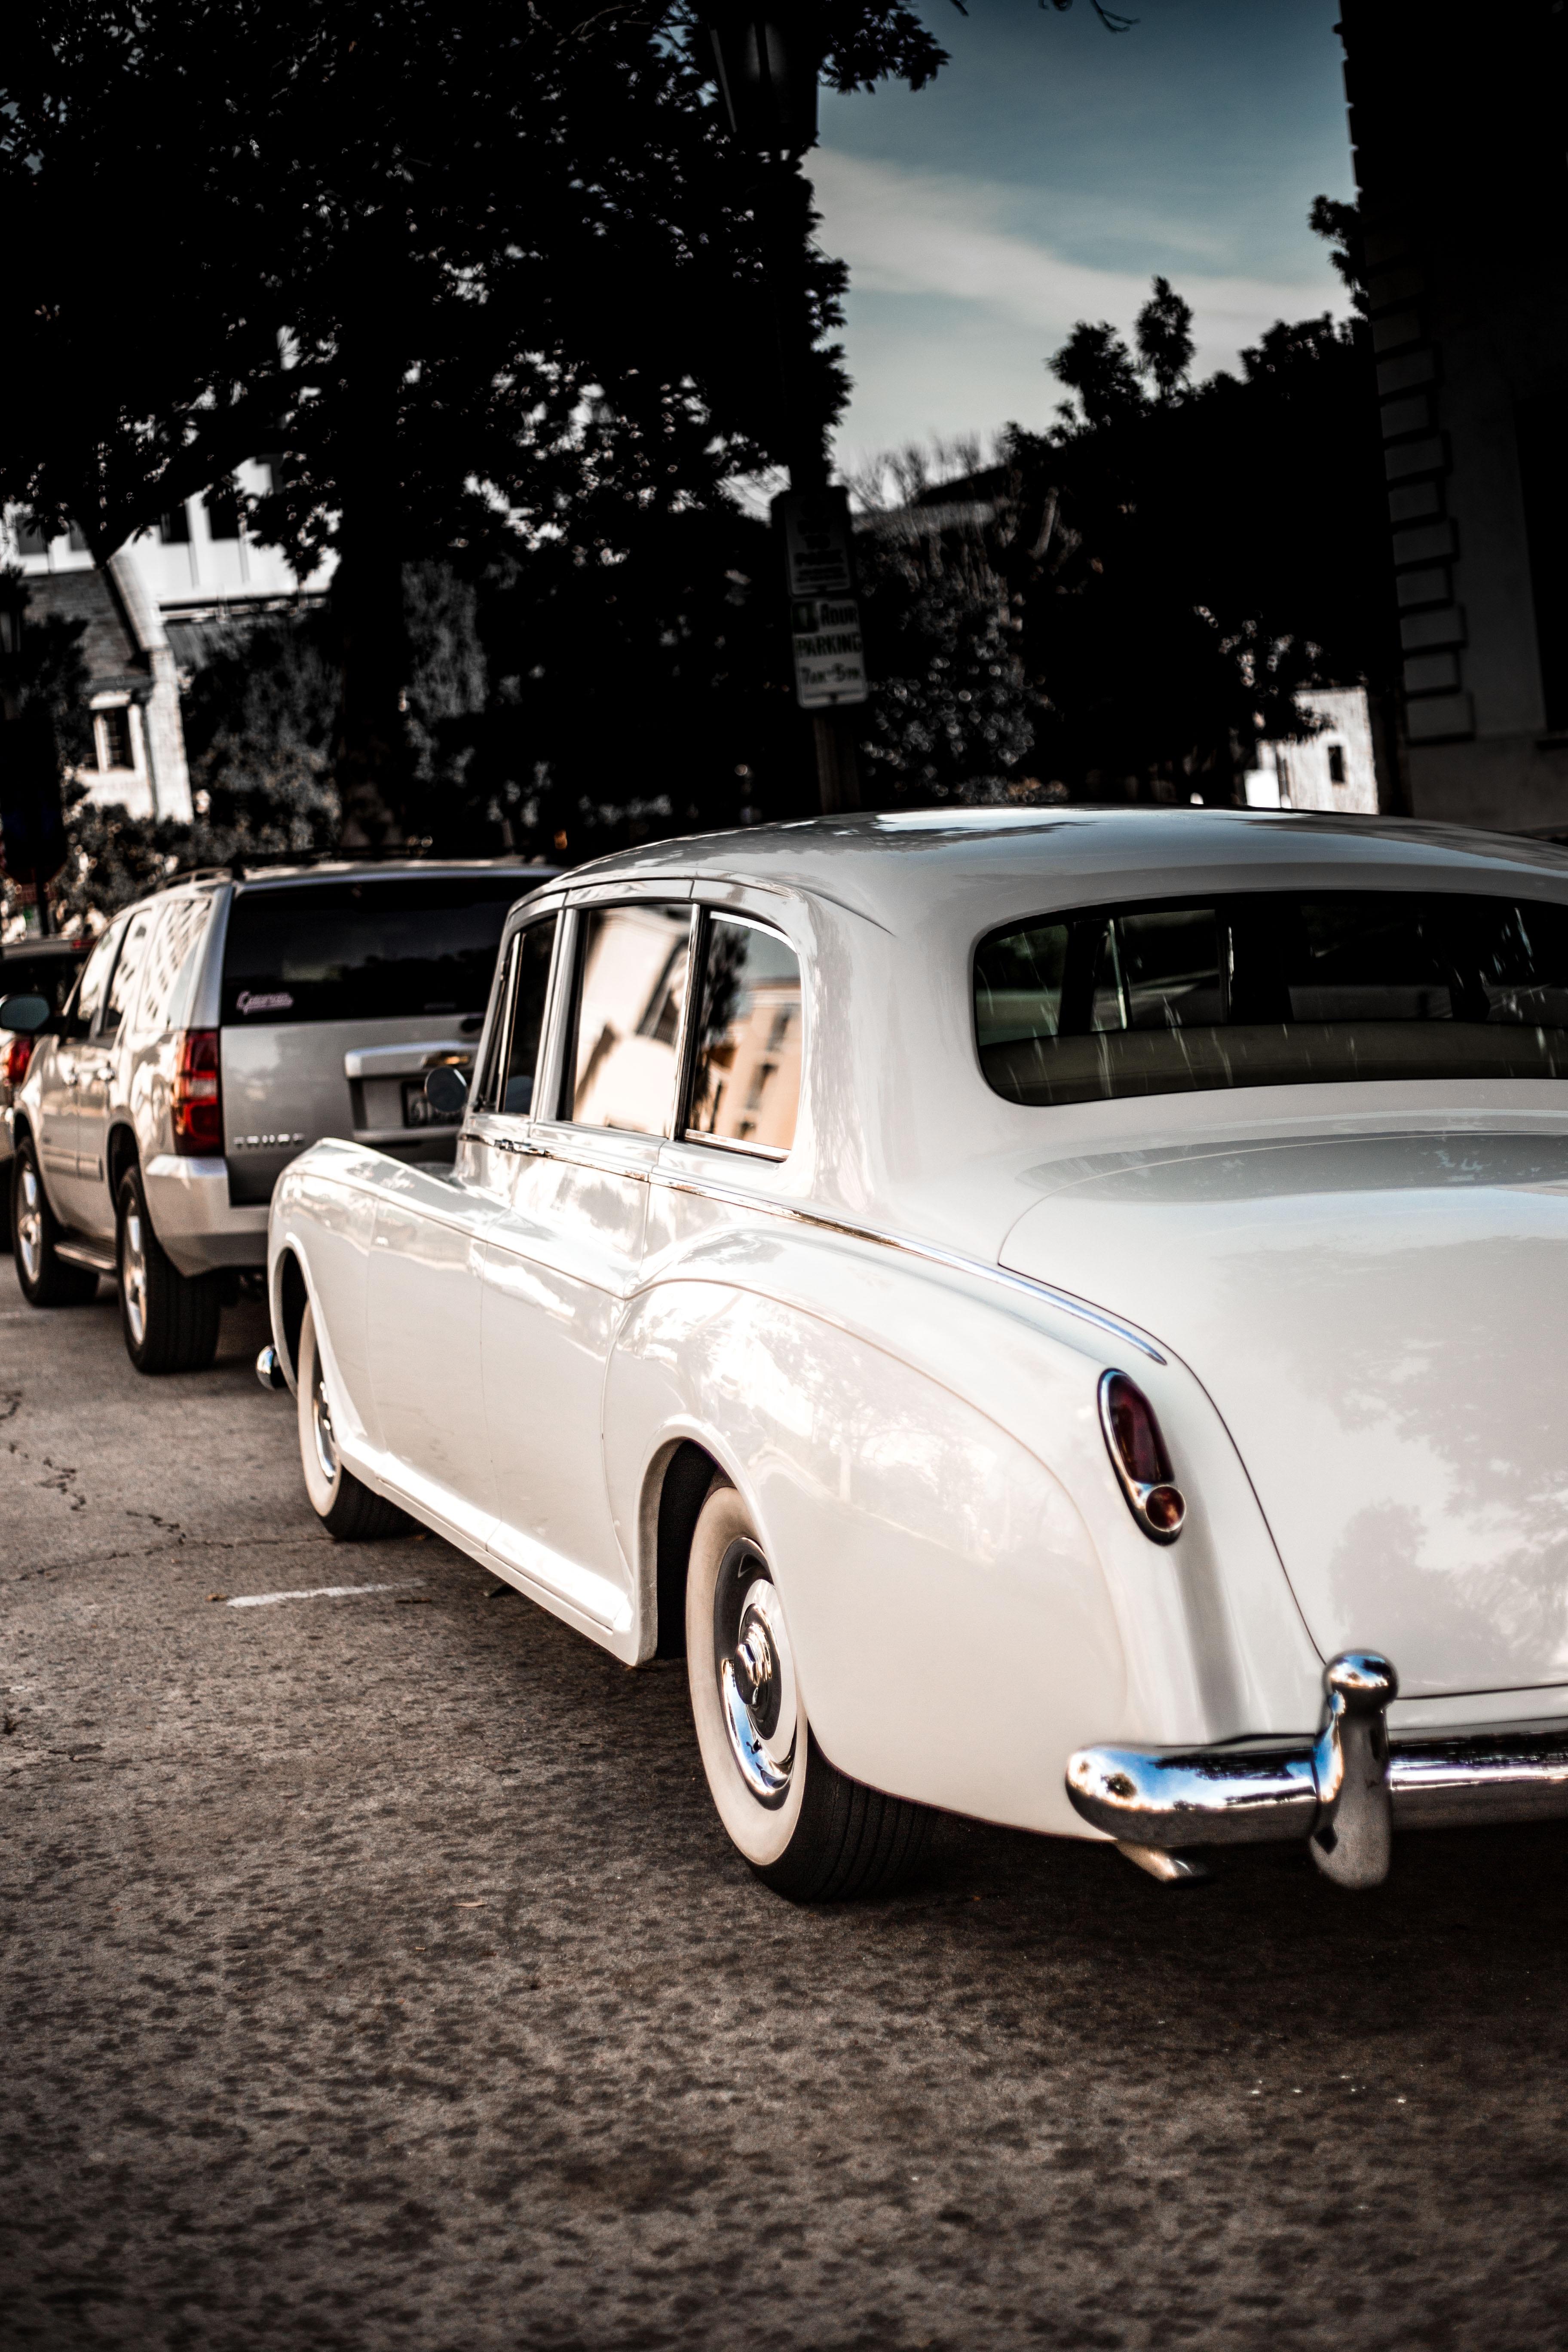 photo of white classic sedan